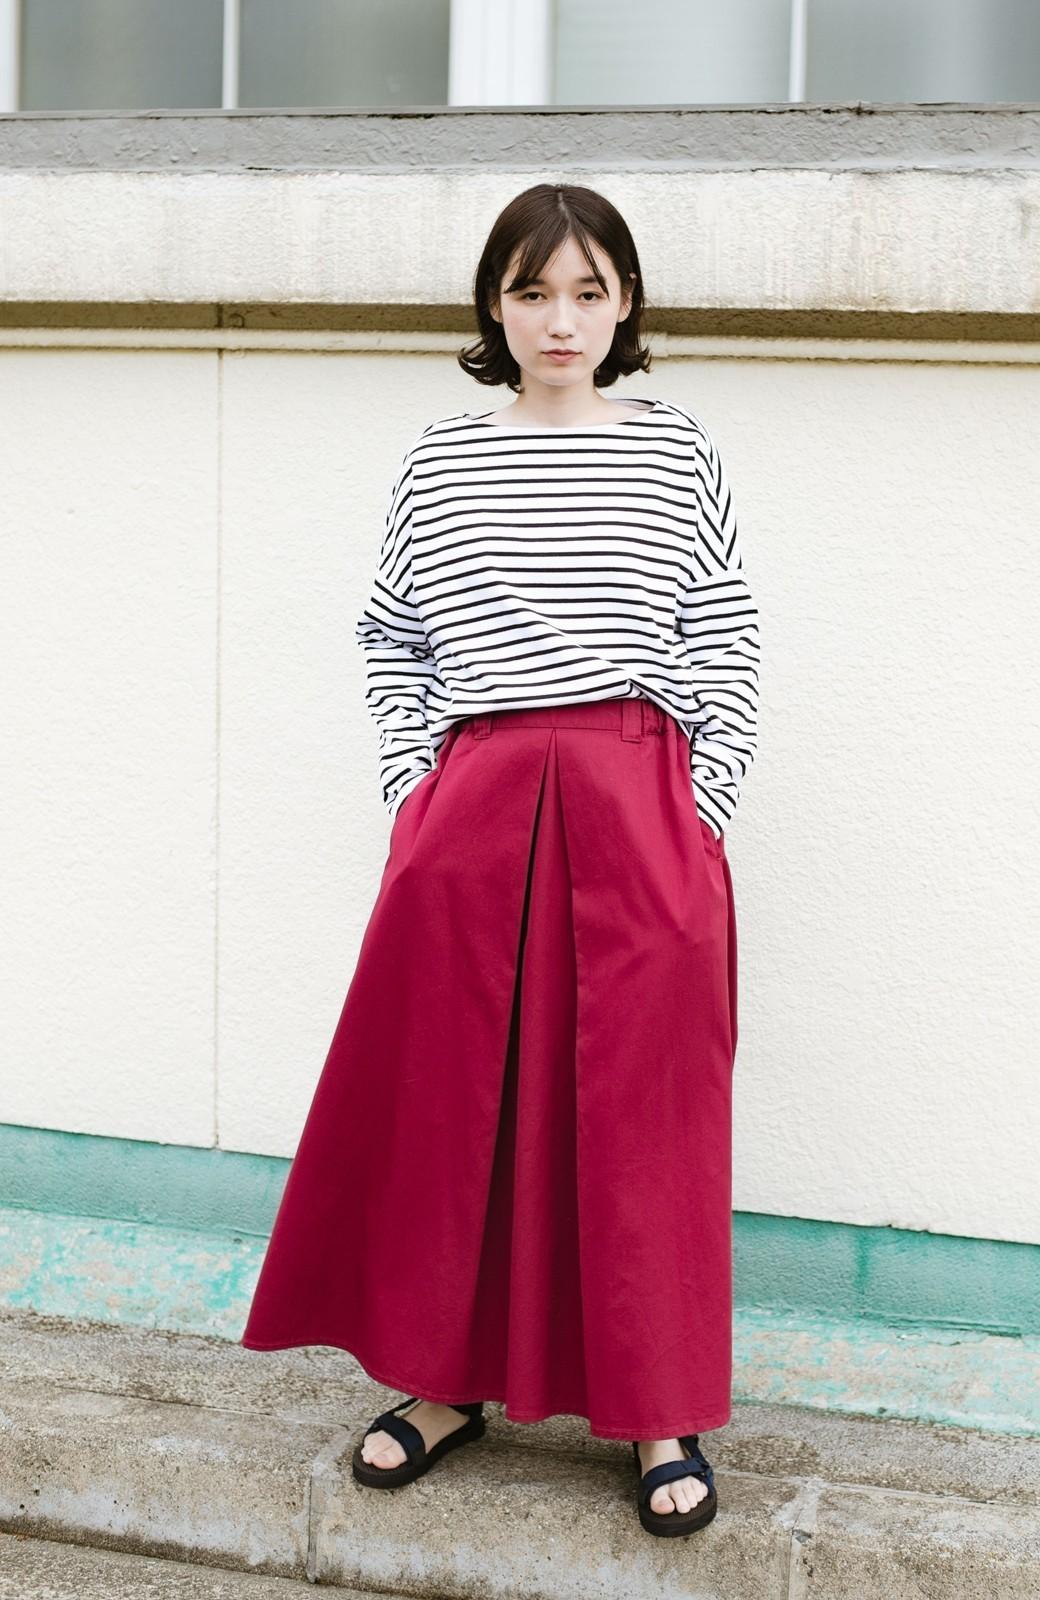 haco! ロングシーズン楽しめる タックボリュームのチノロングスカート <パープル>の商品写真12